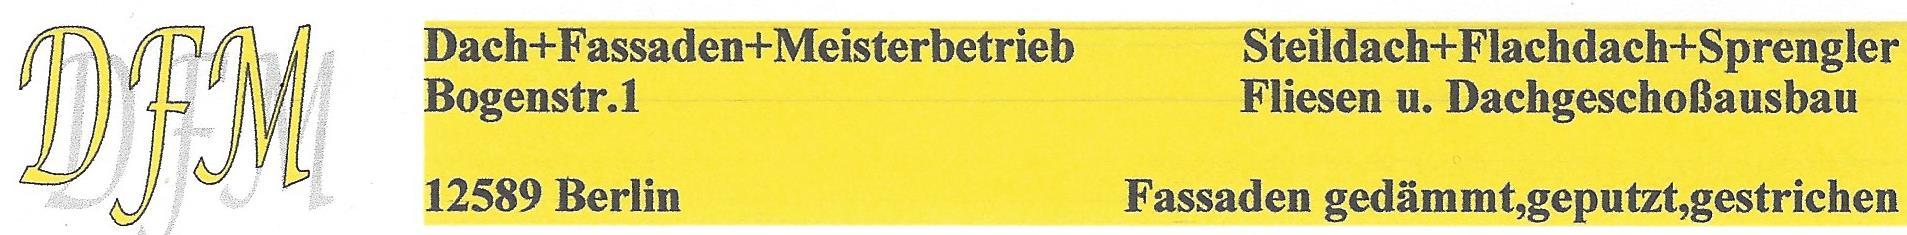 marko burchard dachdeckerei k nigs wusterhausen im. Black Bedroom Furniture Sets. Home Design Ideas